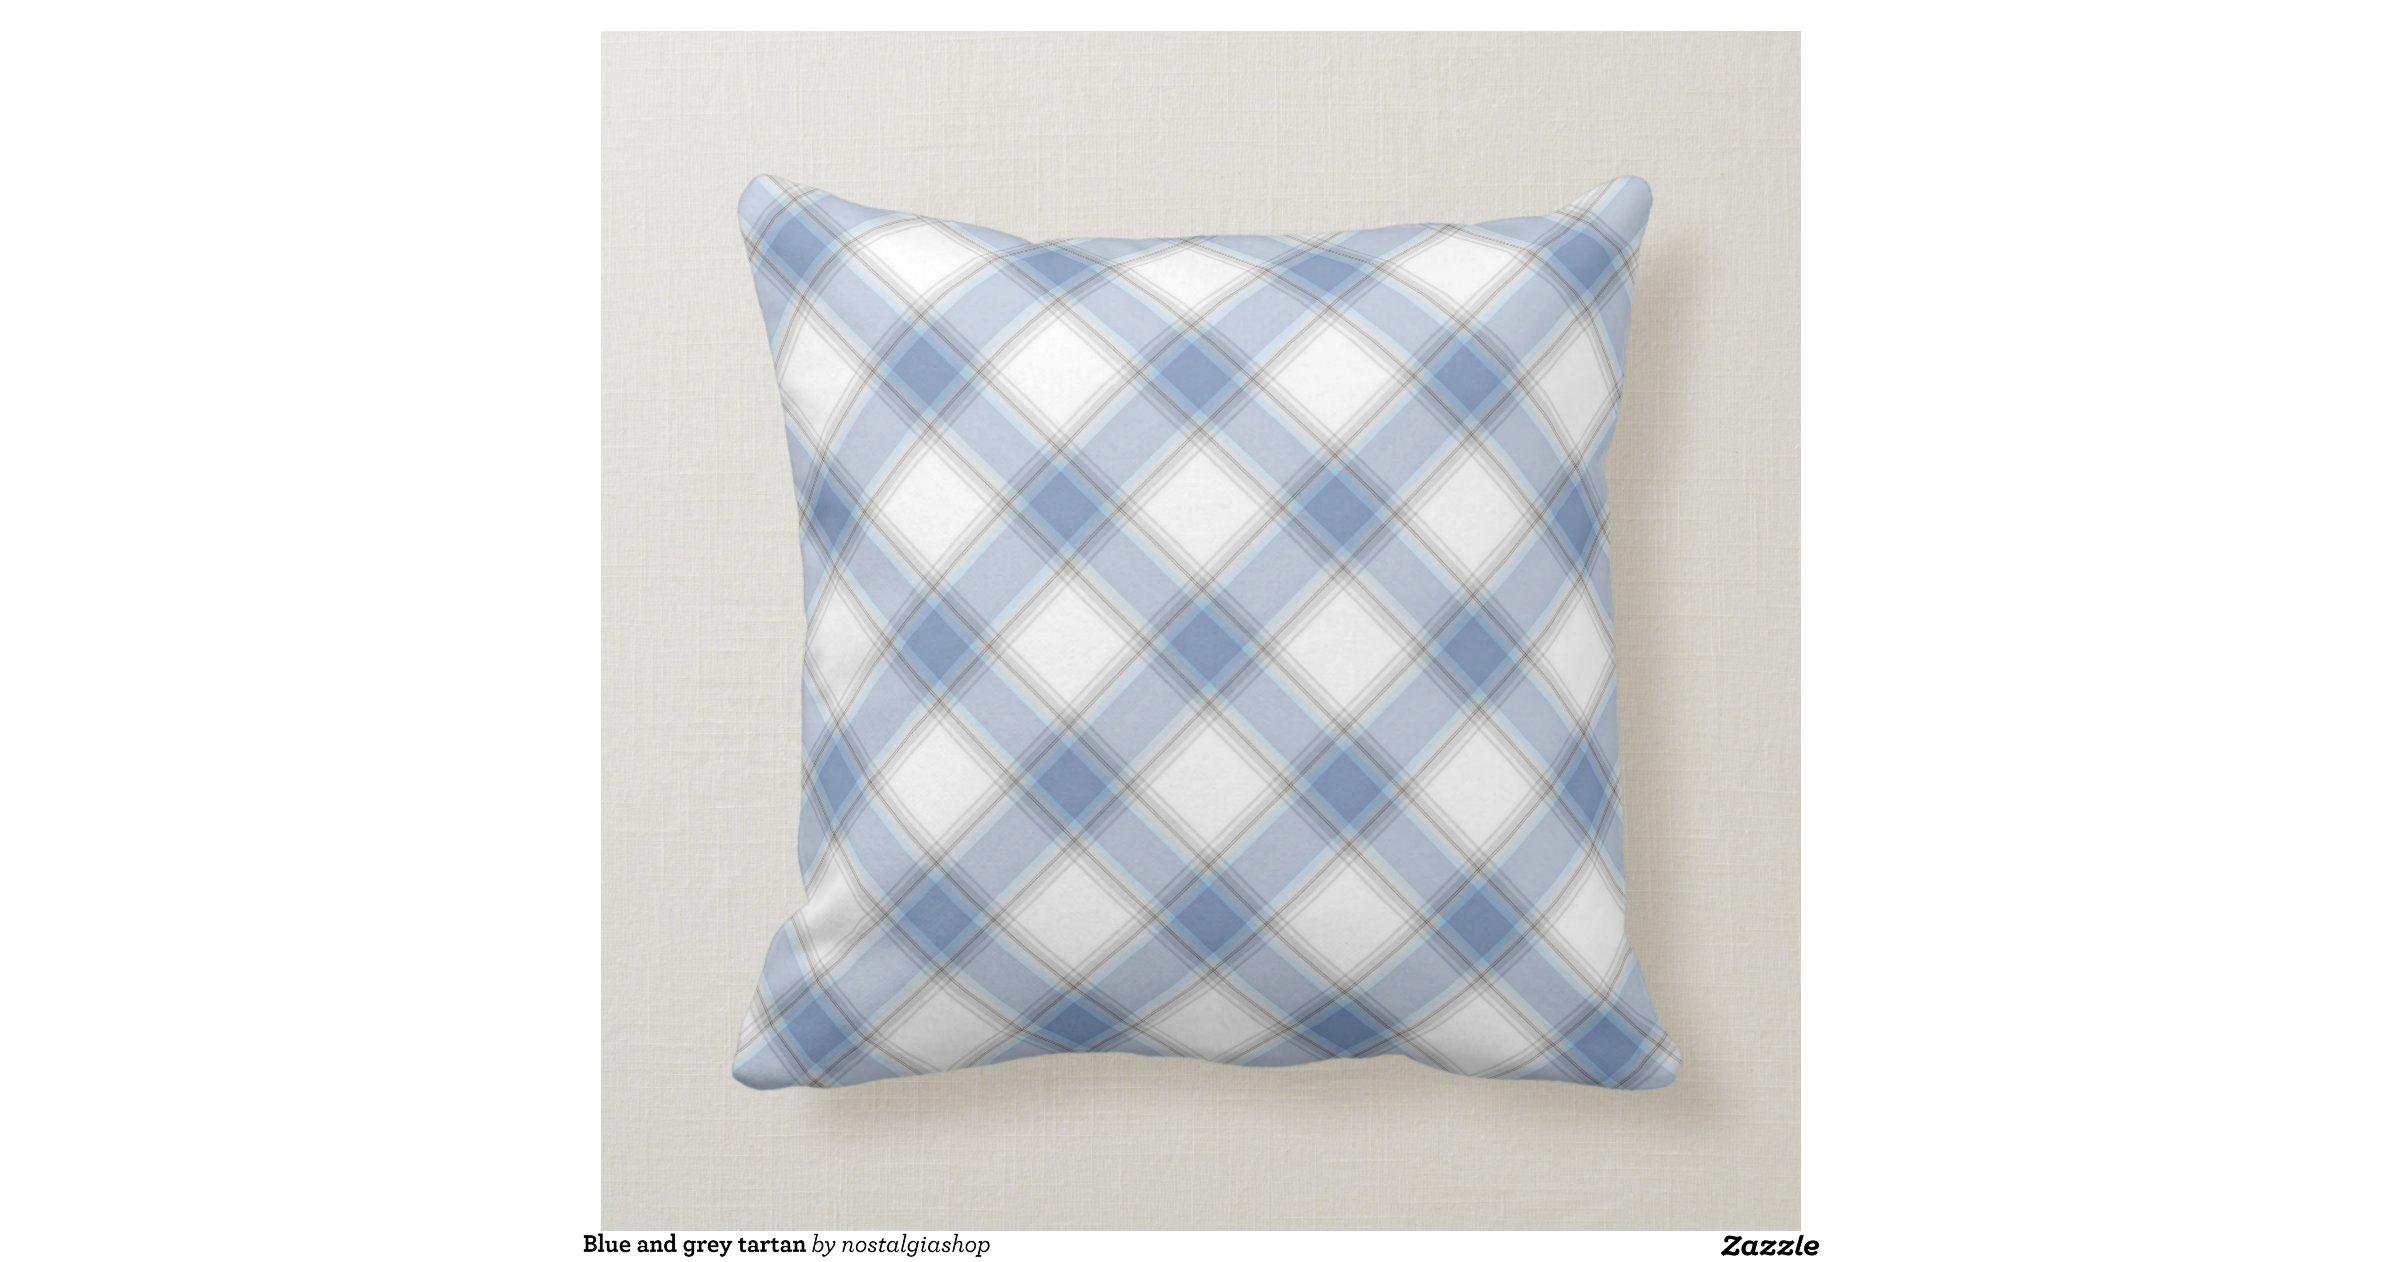 Greyish Blue Throw Pillows : Blue and grey tartan throw pillows Zazzle